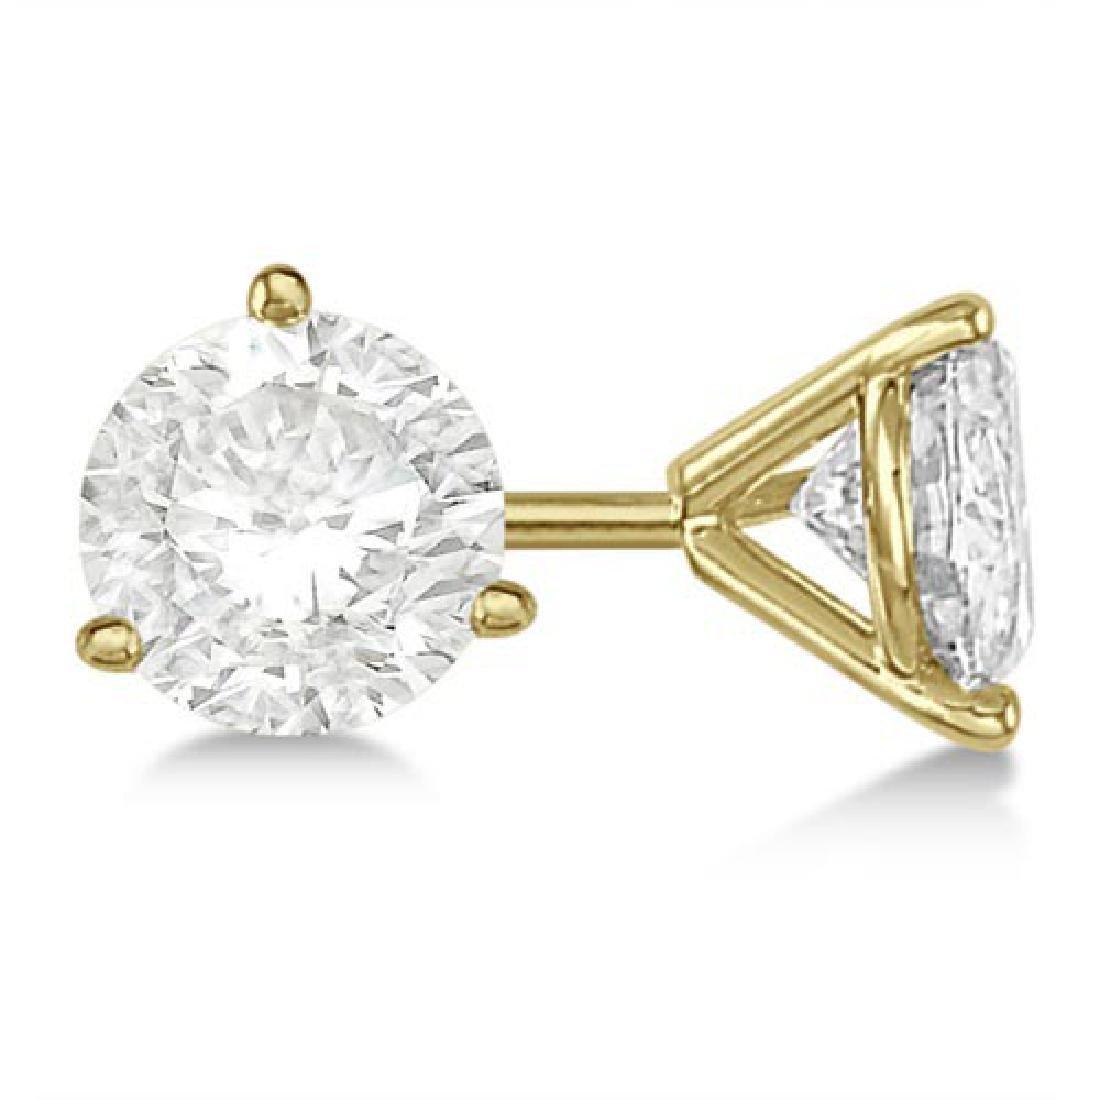 3.00ct. 3-Prong Martini Diamond Stud Earrings 18kt Yell